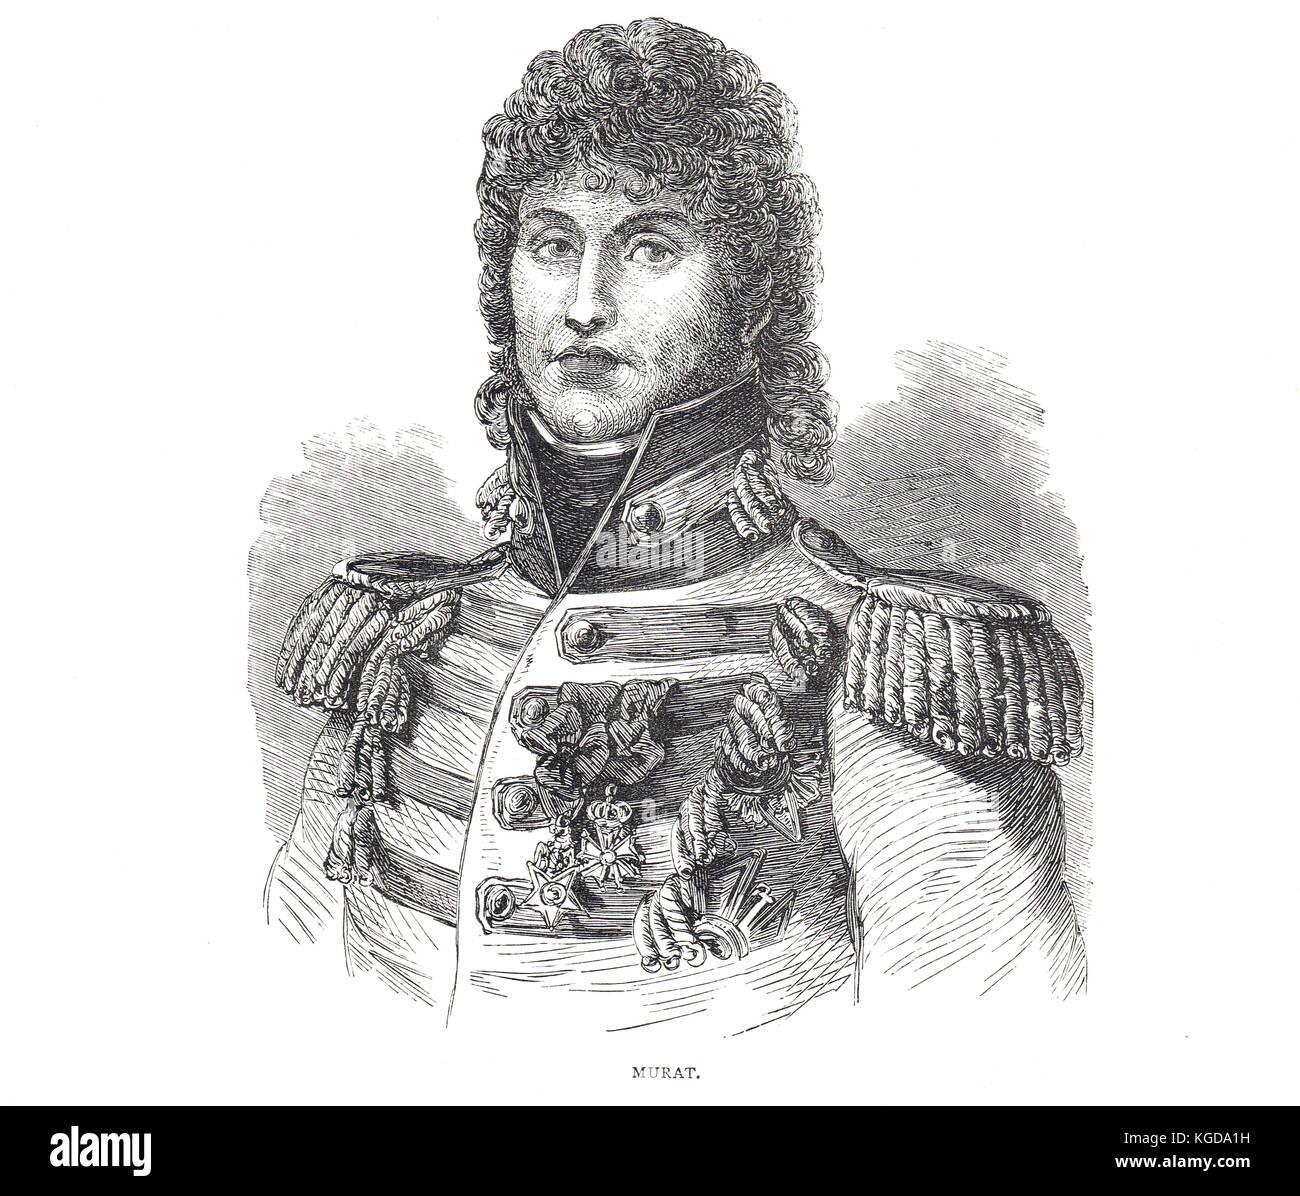 Joachim Napoleon Murat, King of  Naples, 1808-15 - Stock Image